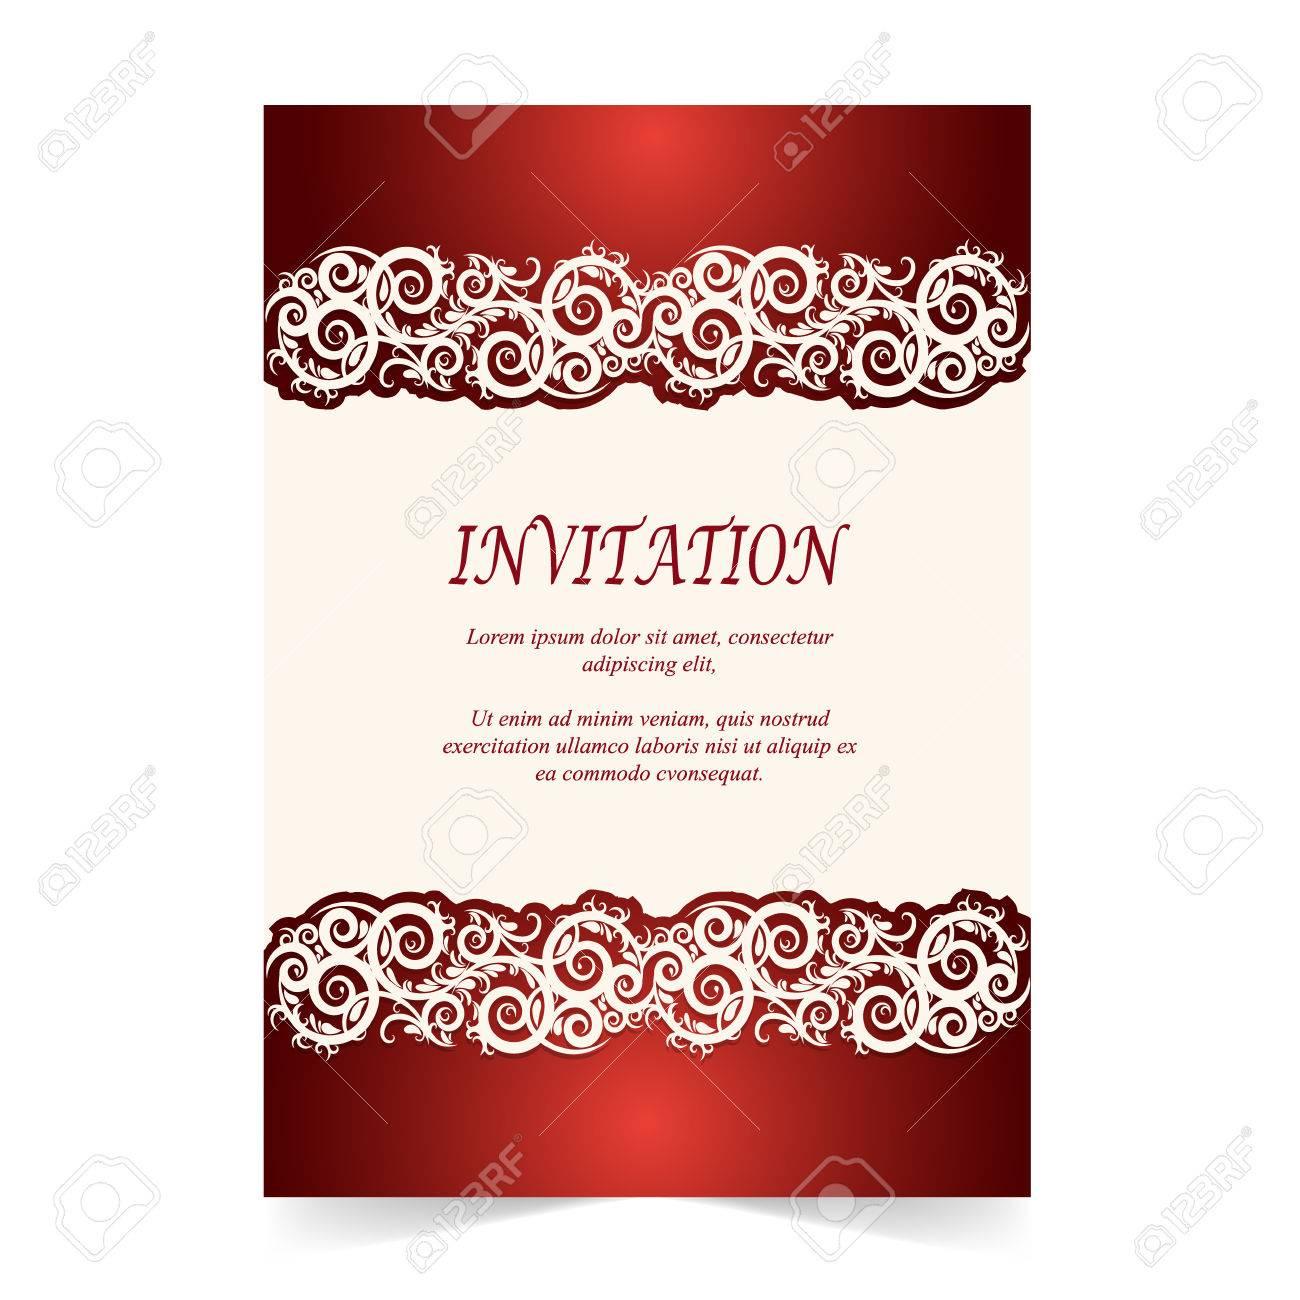 Invitation card wedding card with ornament on ivory and red invitation card wedding card with ornament on ivory and red background stock vector 78429391 stopboris Choice Image